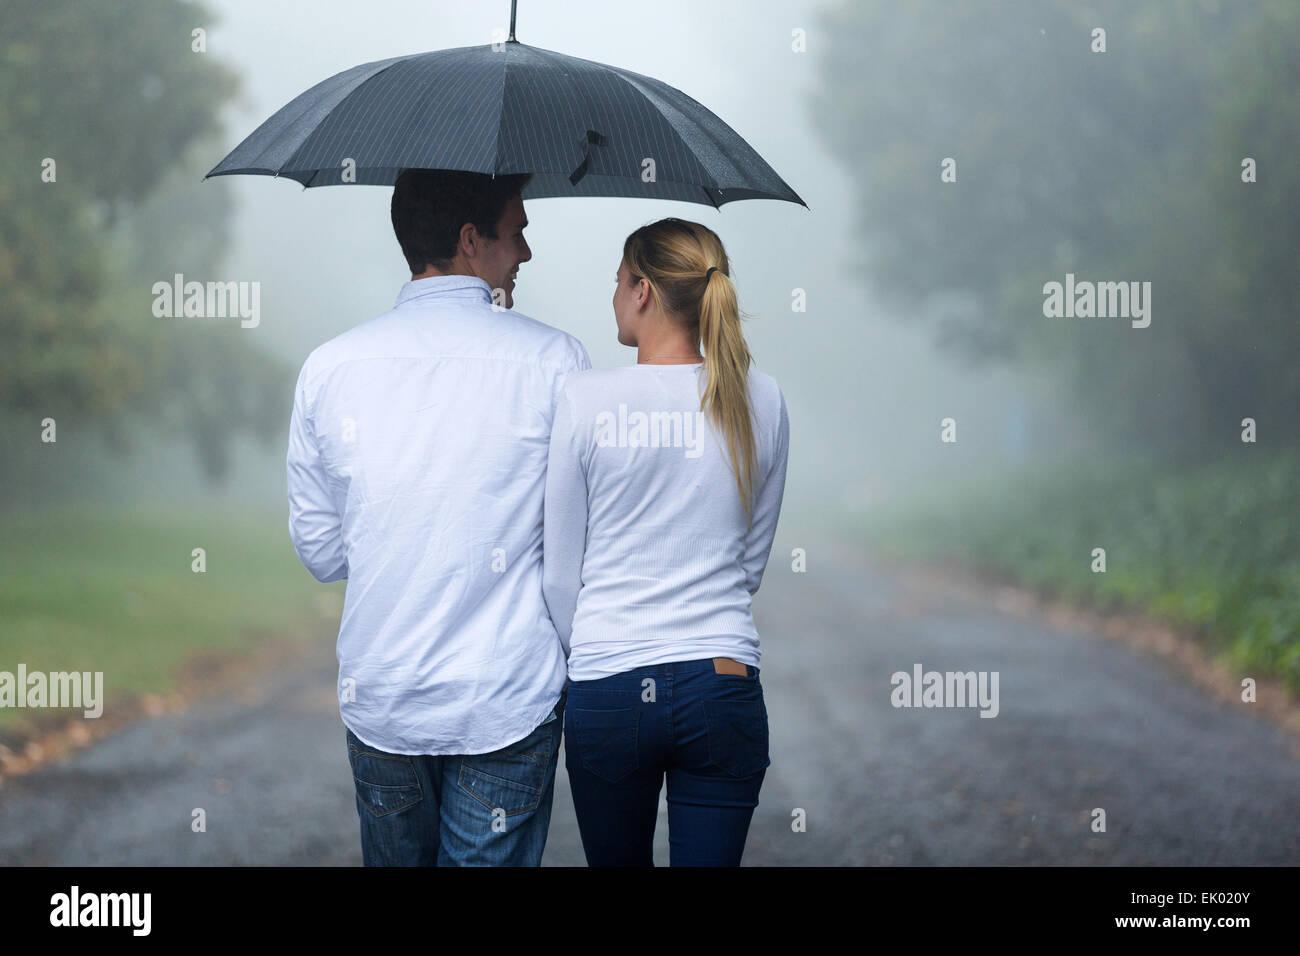 rear view of romantic couple walking in rain - Stock Image